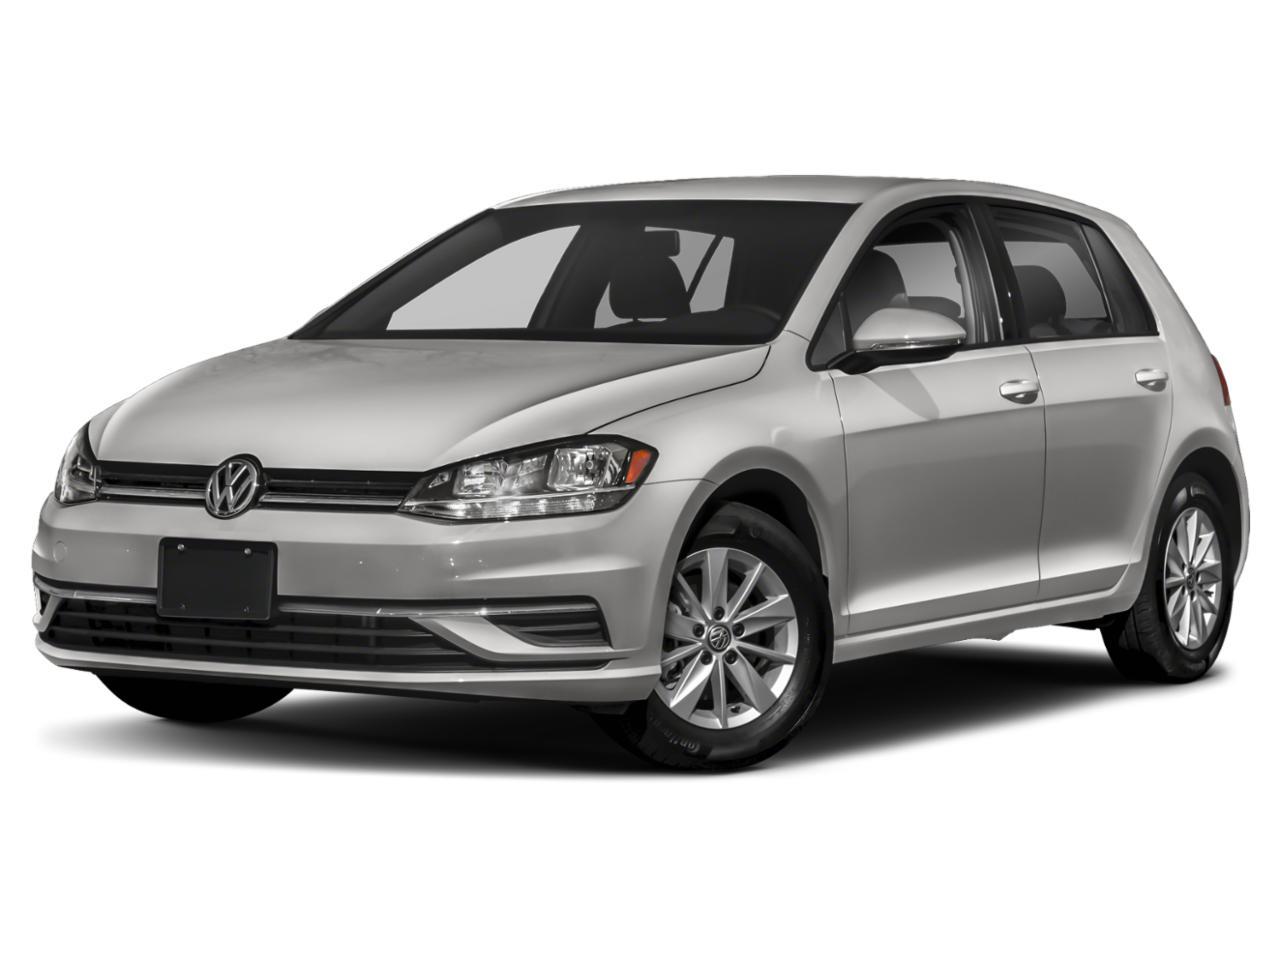 2018 Volkswagen Golf Vehicle Photo in San Antonio, TX 78257